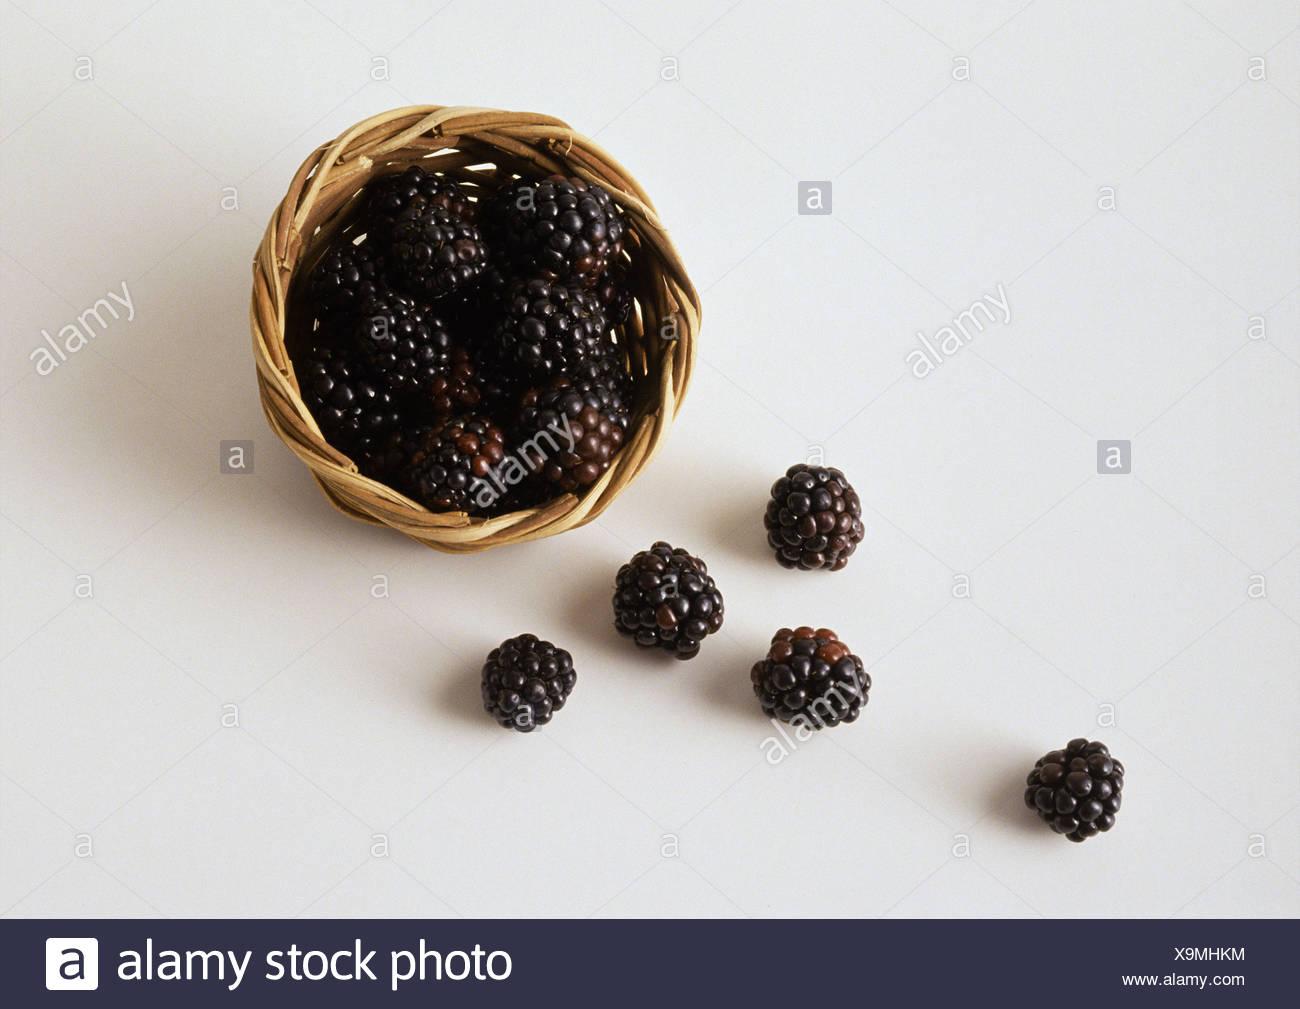 Blackberries spilling out of basket - Stock Image